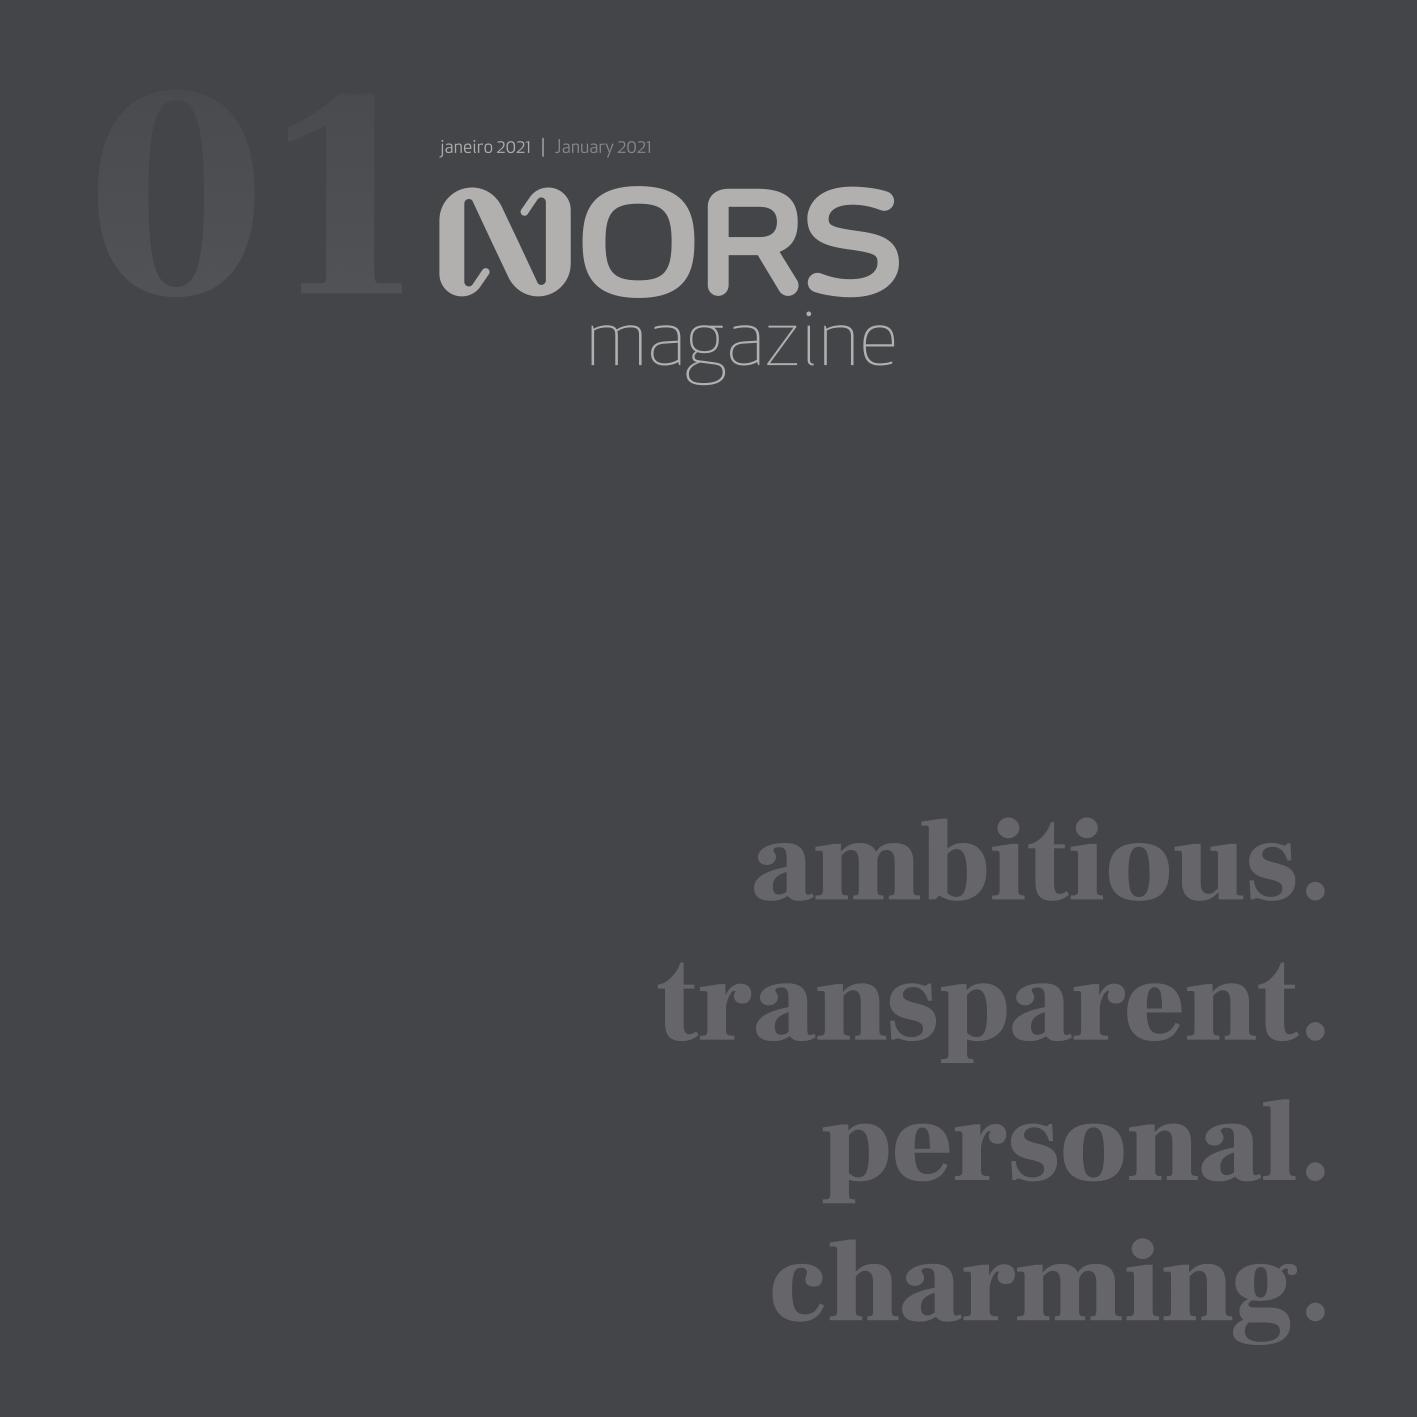 Nors magazine